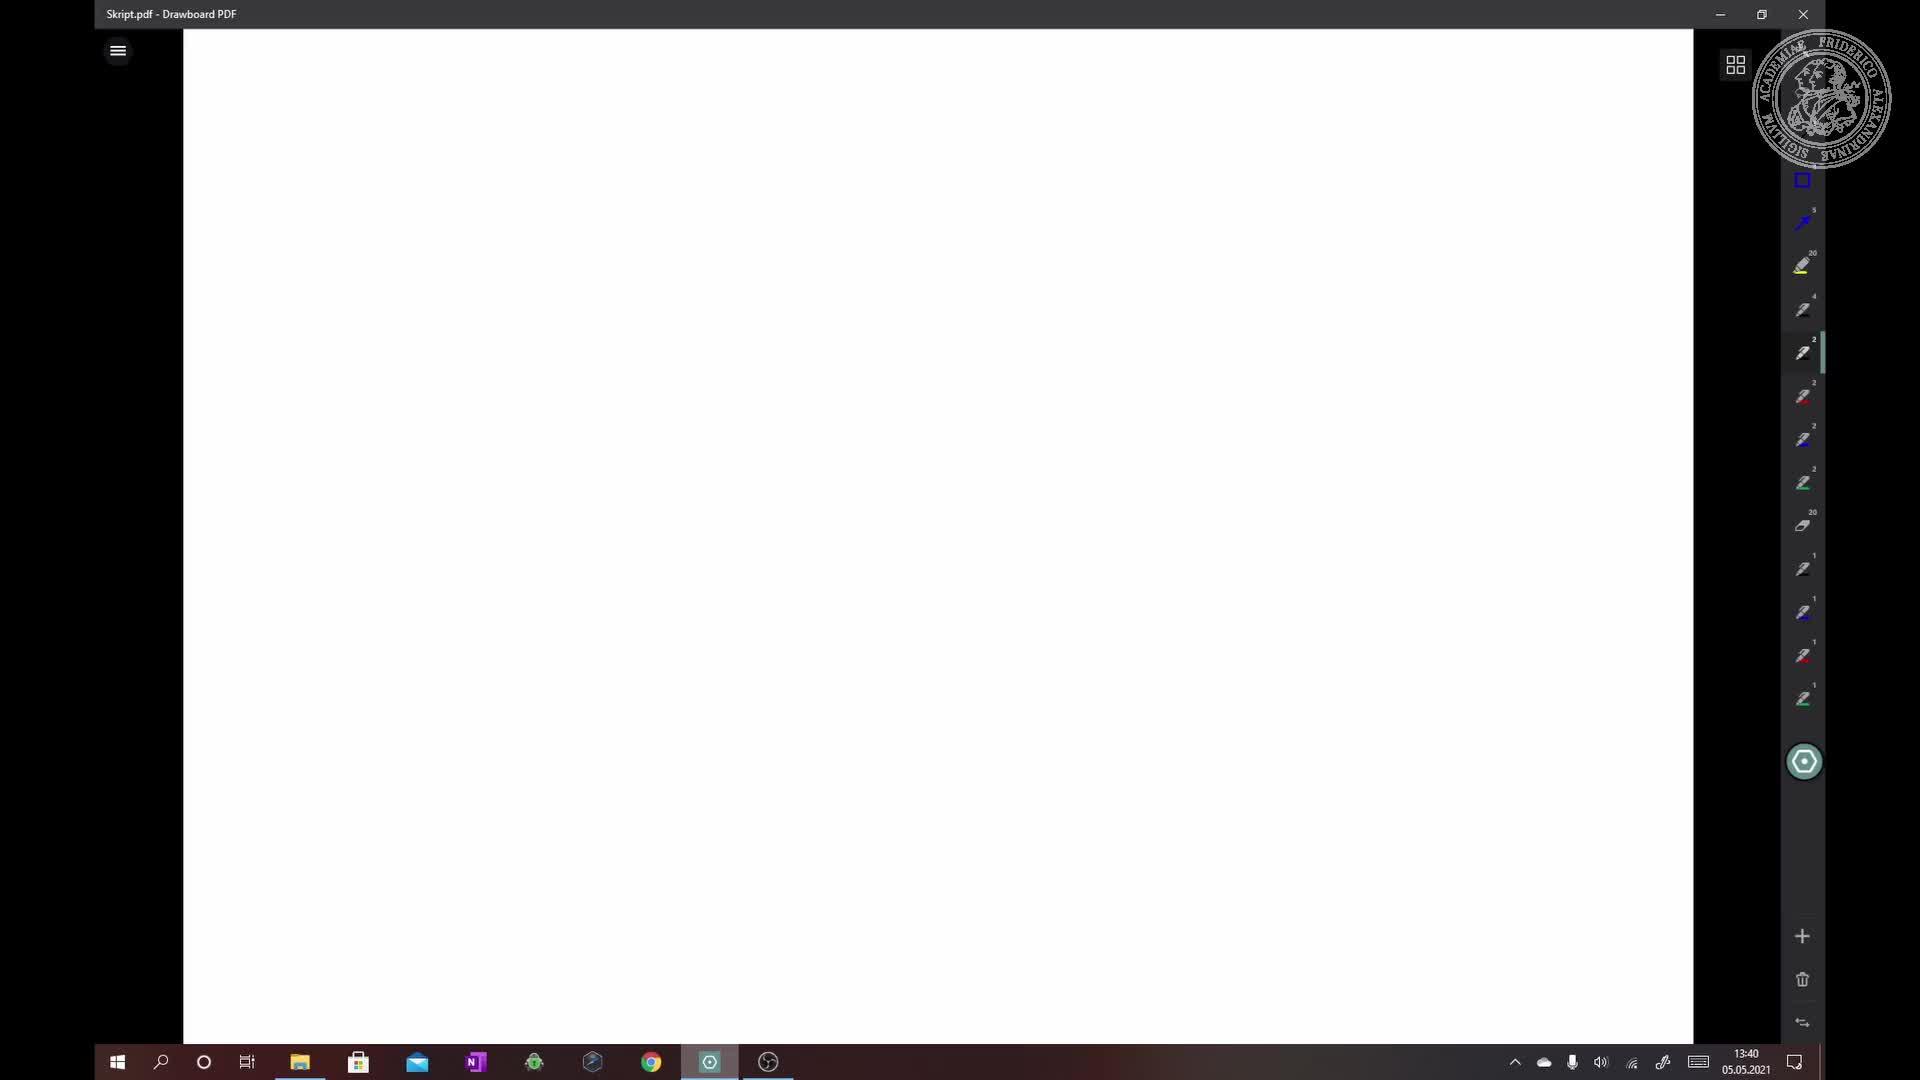 Das kanonische Skalarprodukt preview image